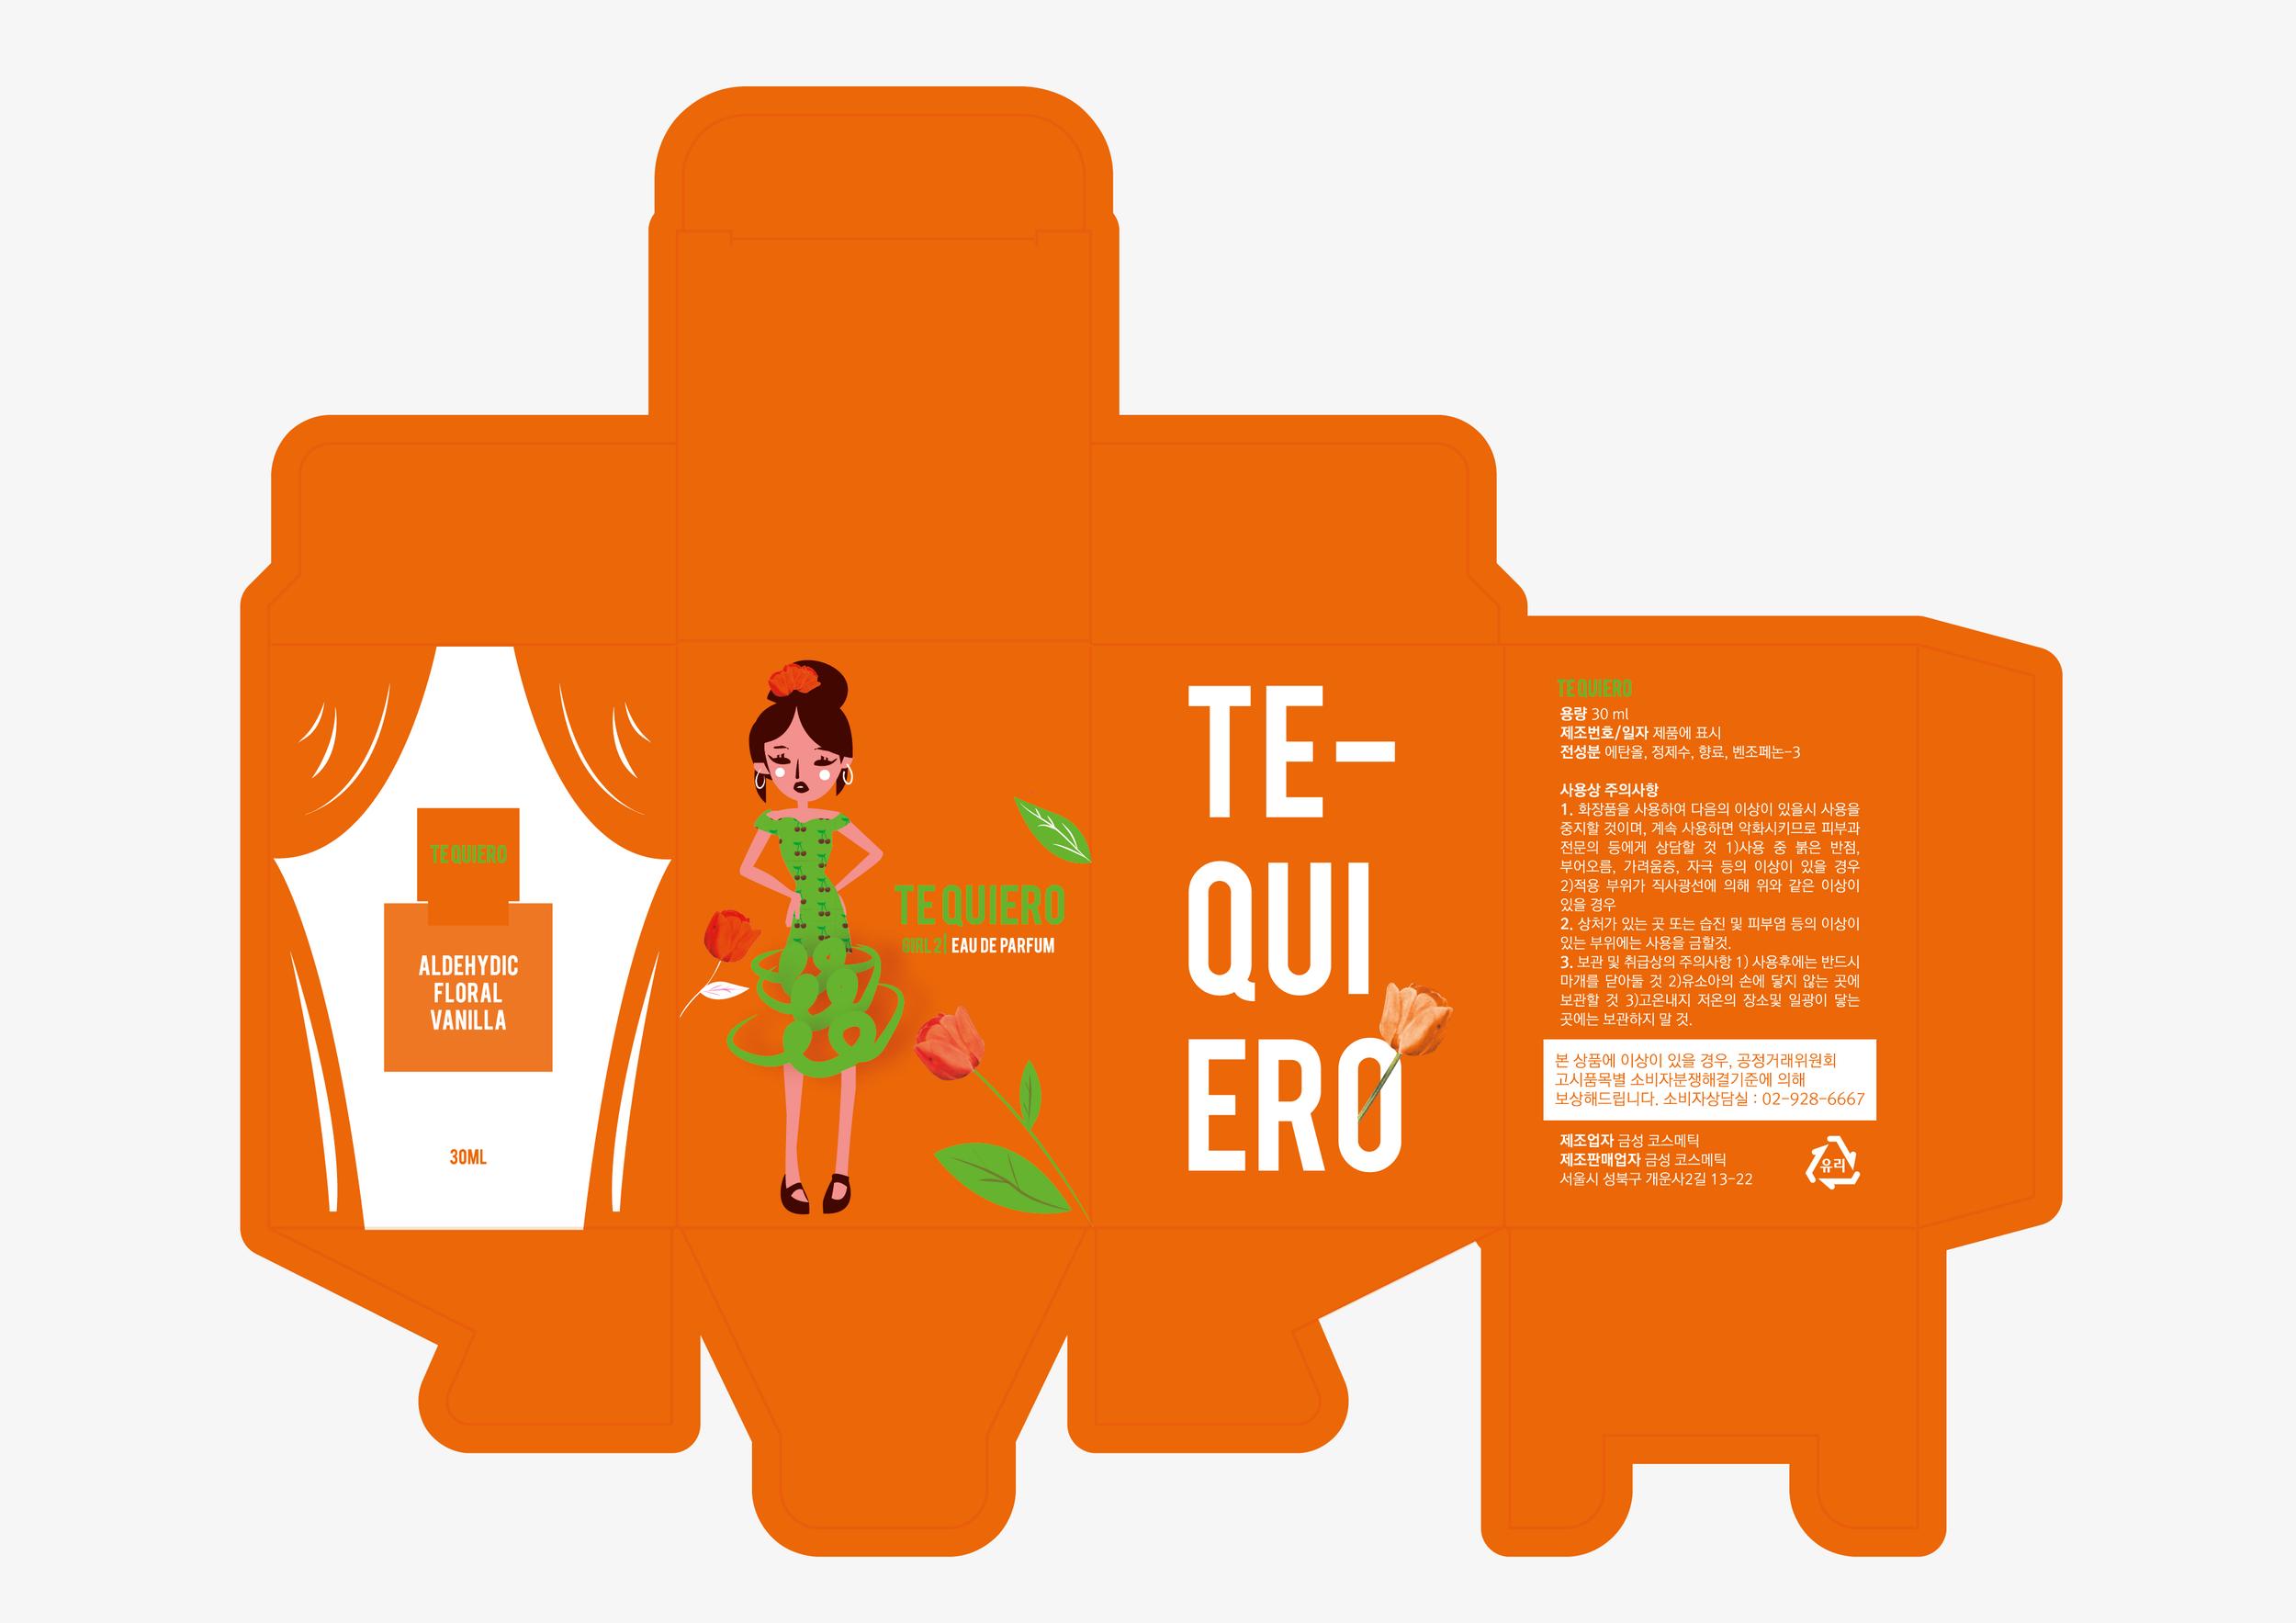 tequieroper_confondogris-05.png